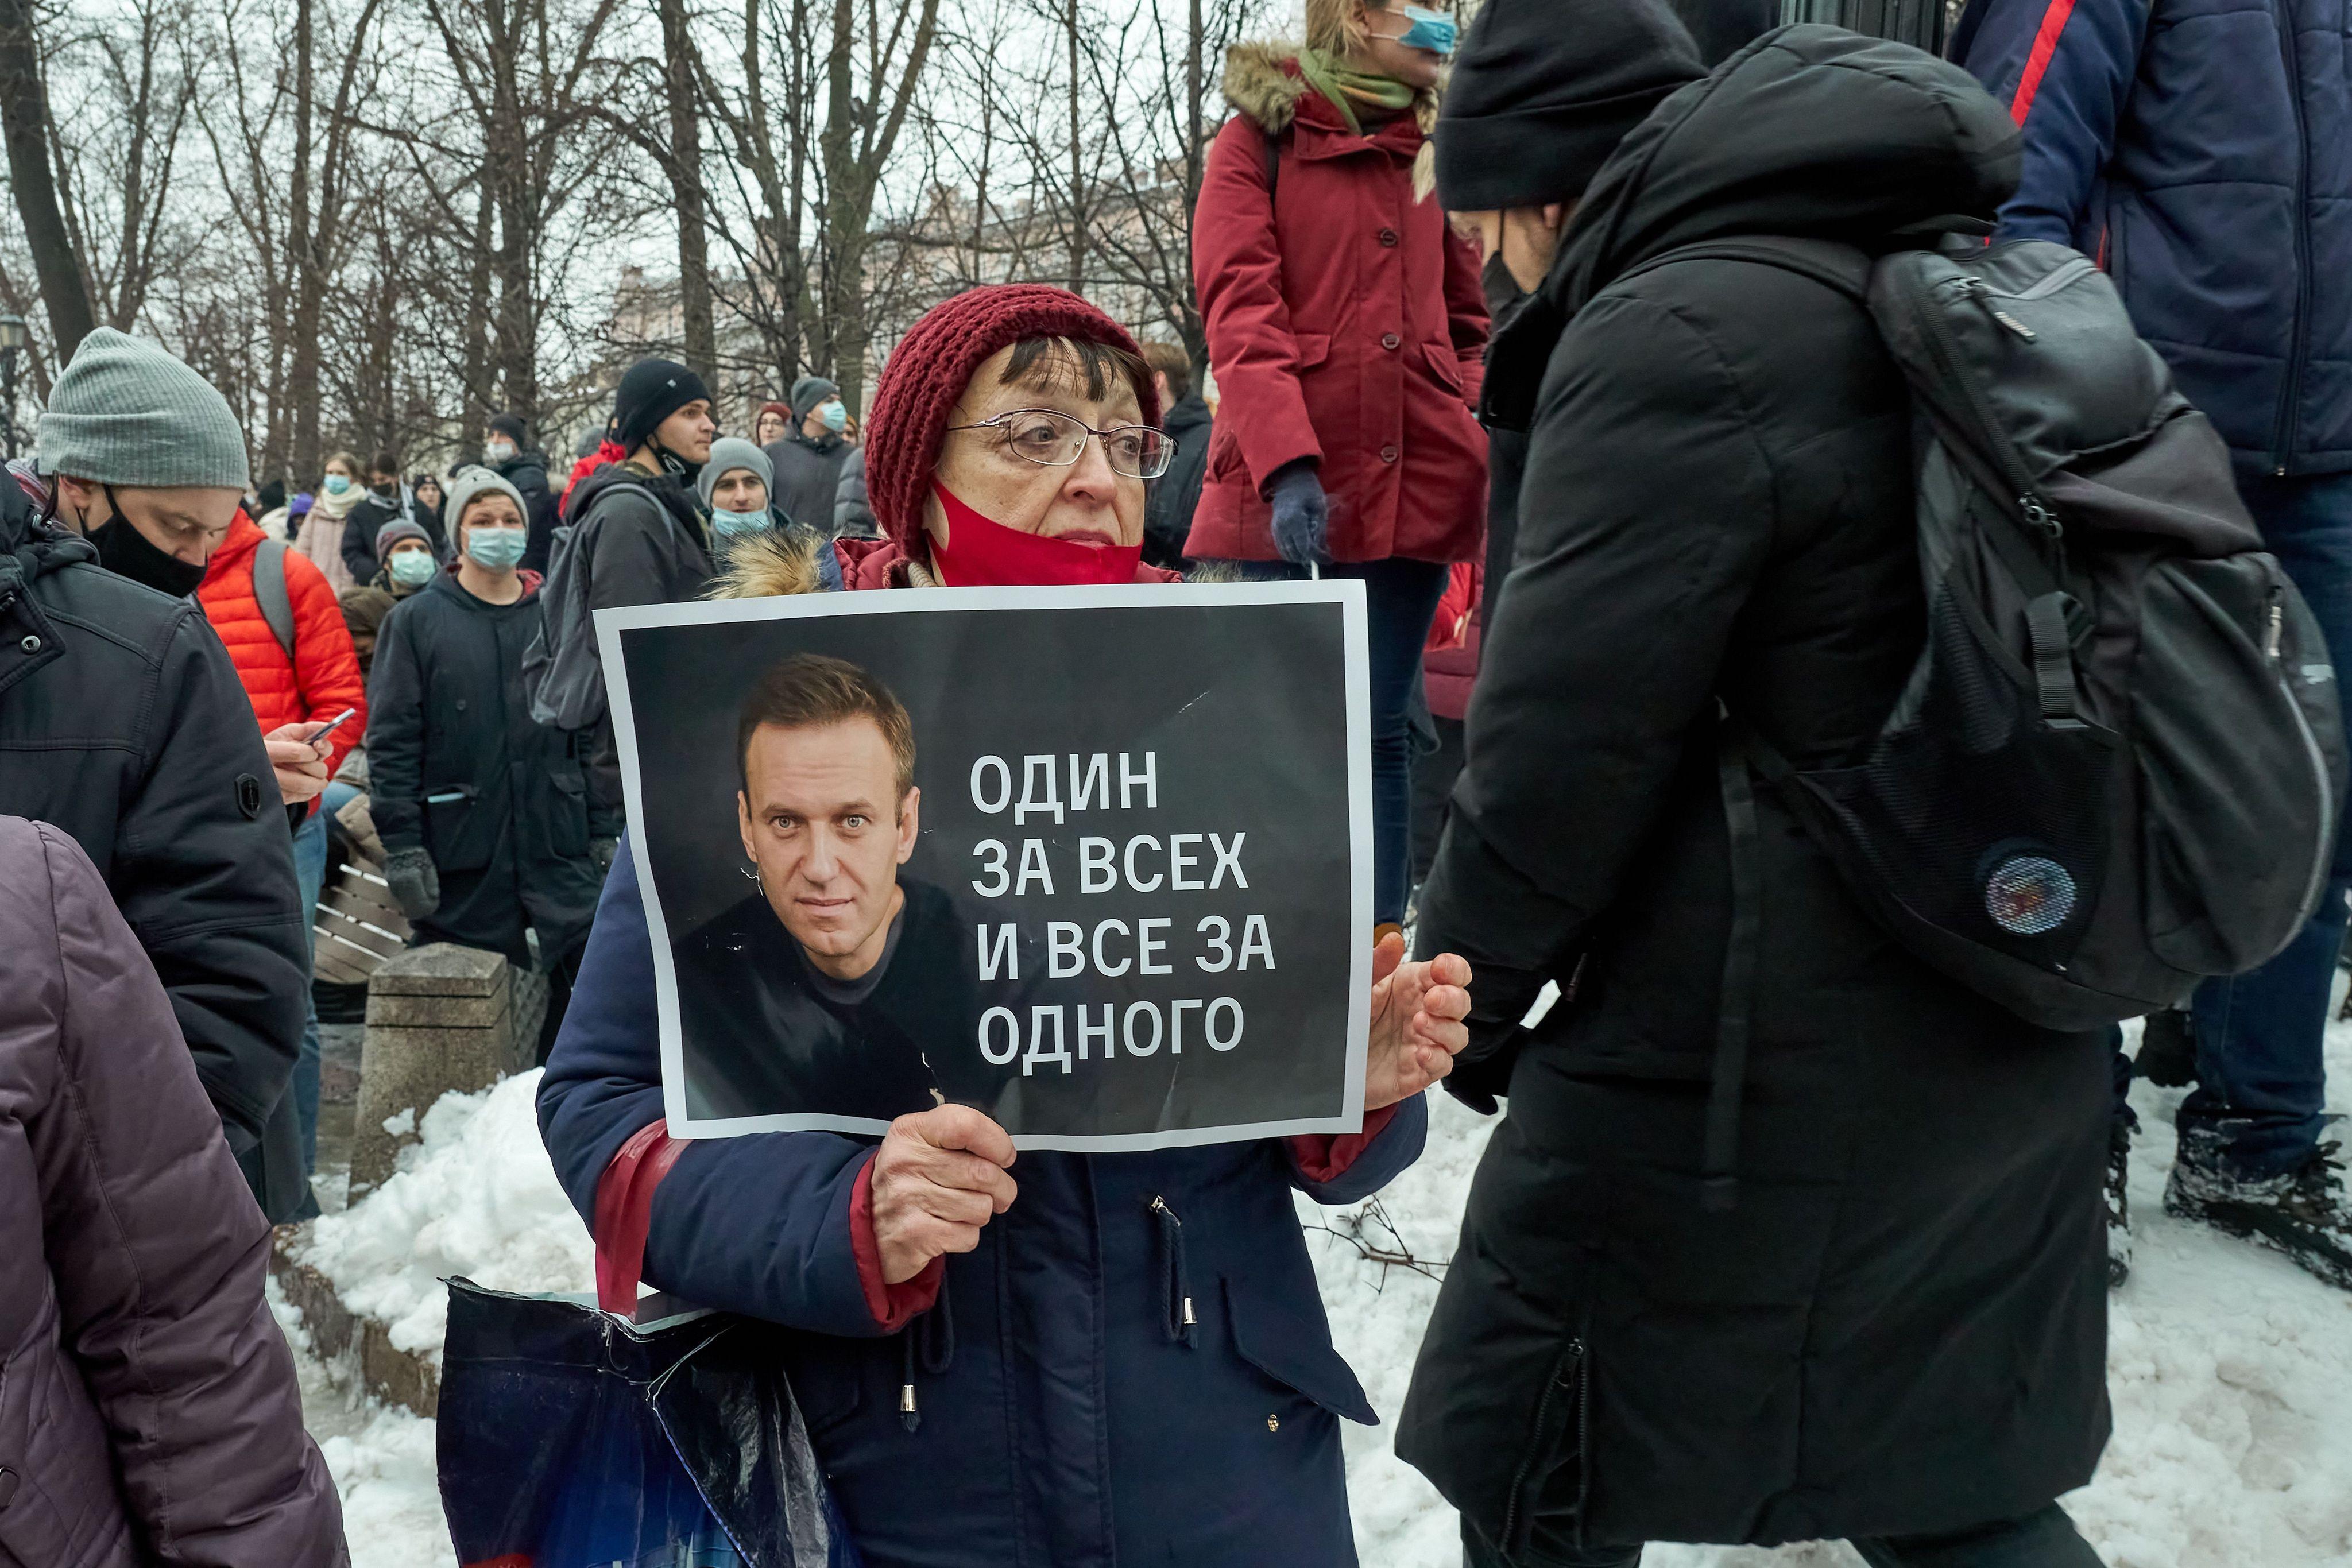 648x415 femme manifeste soutenir alexei navalny pancarte indiquant tous tous moscou 23 janvier 2021